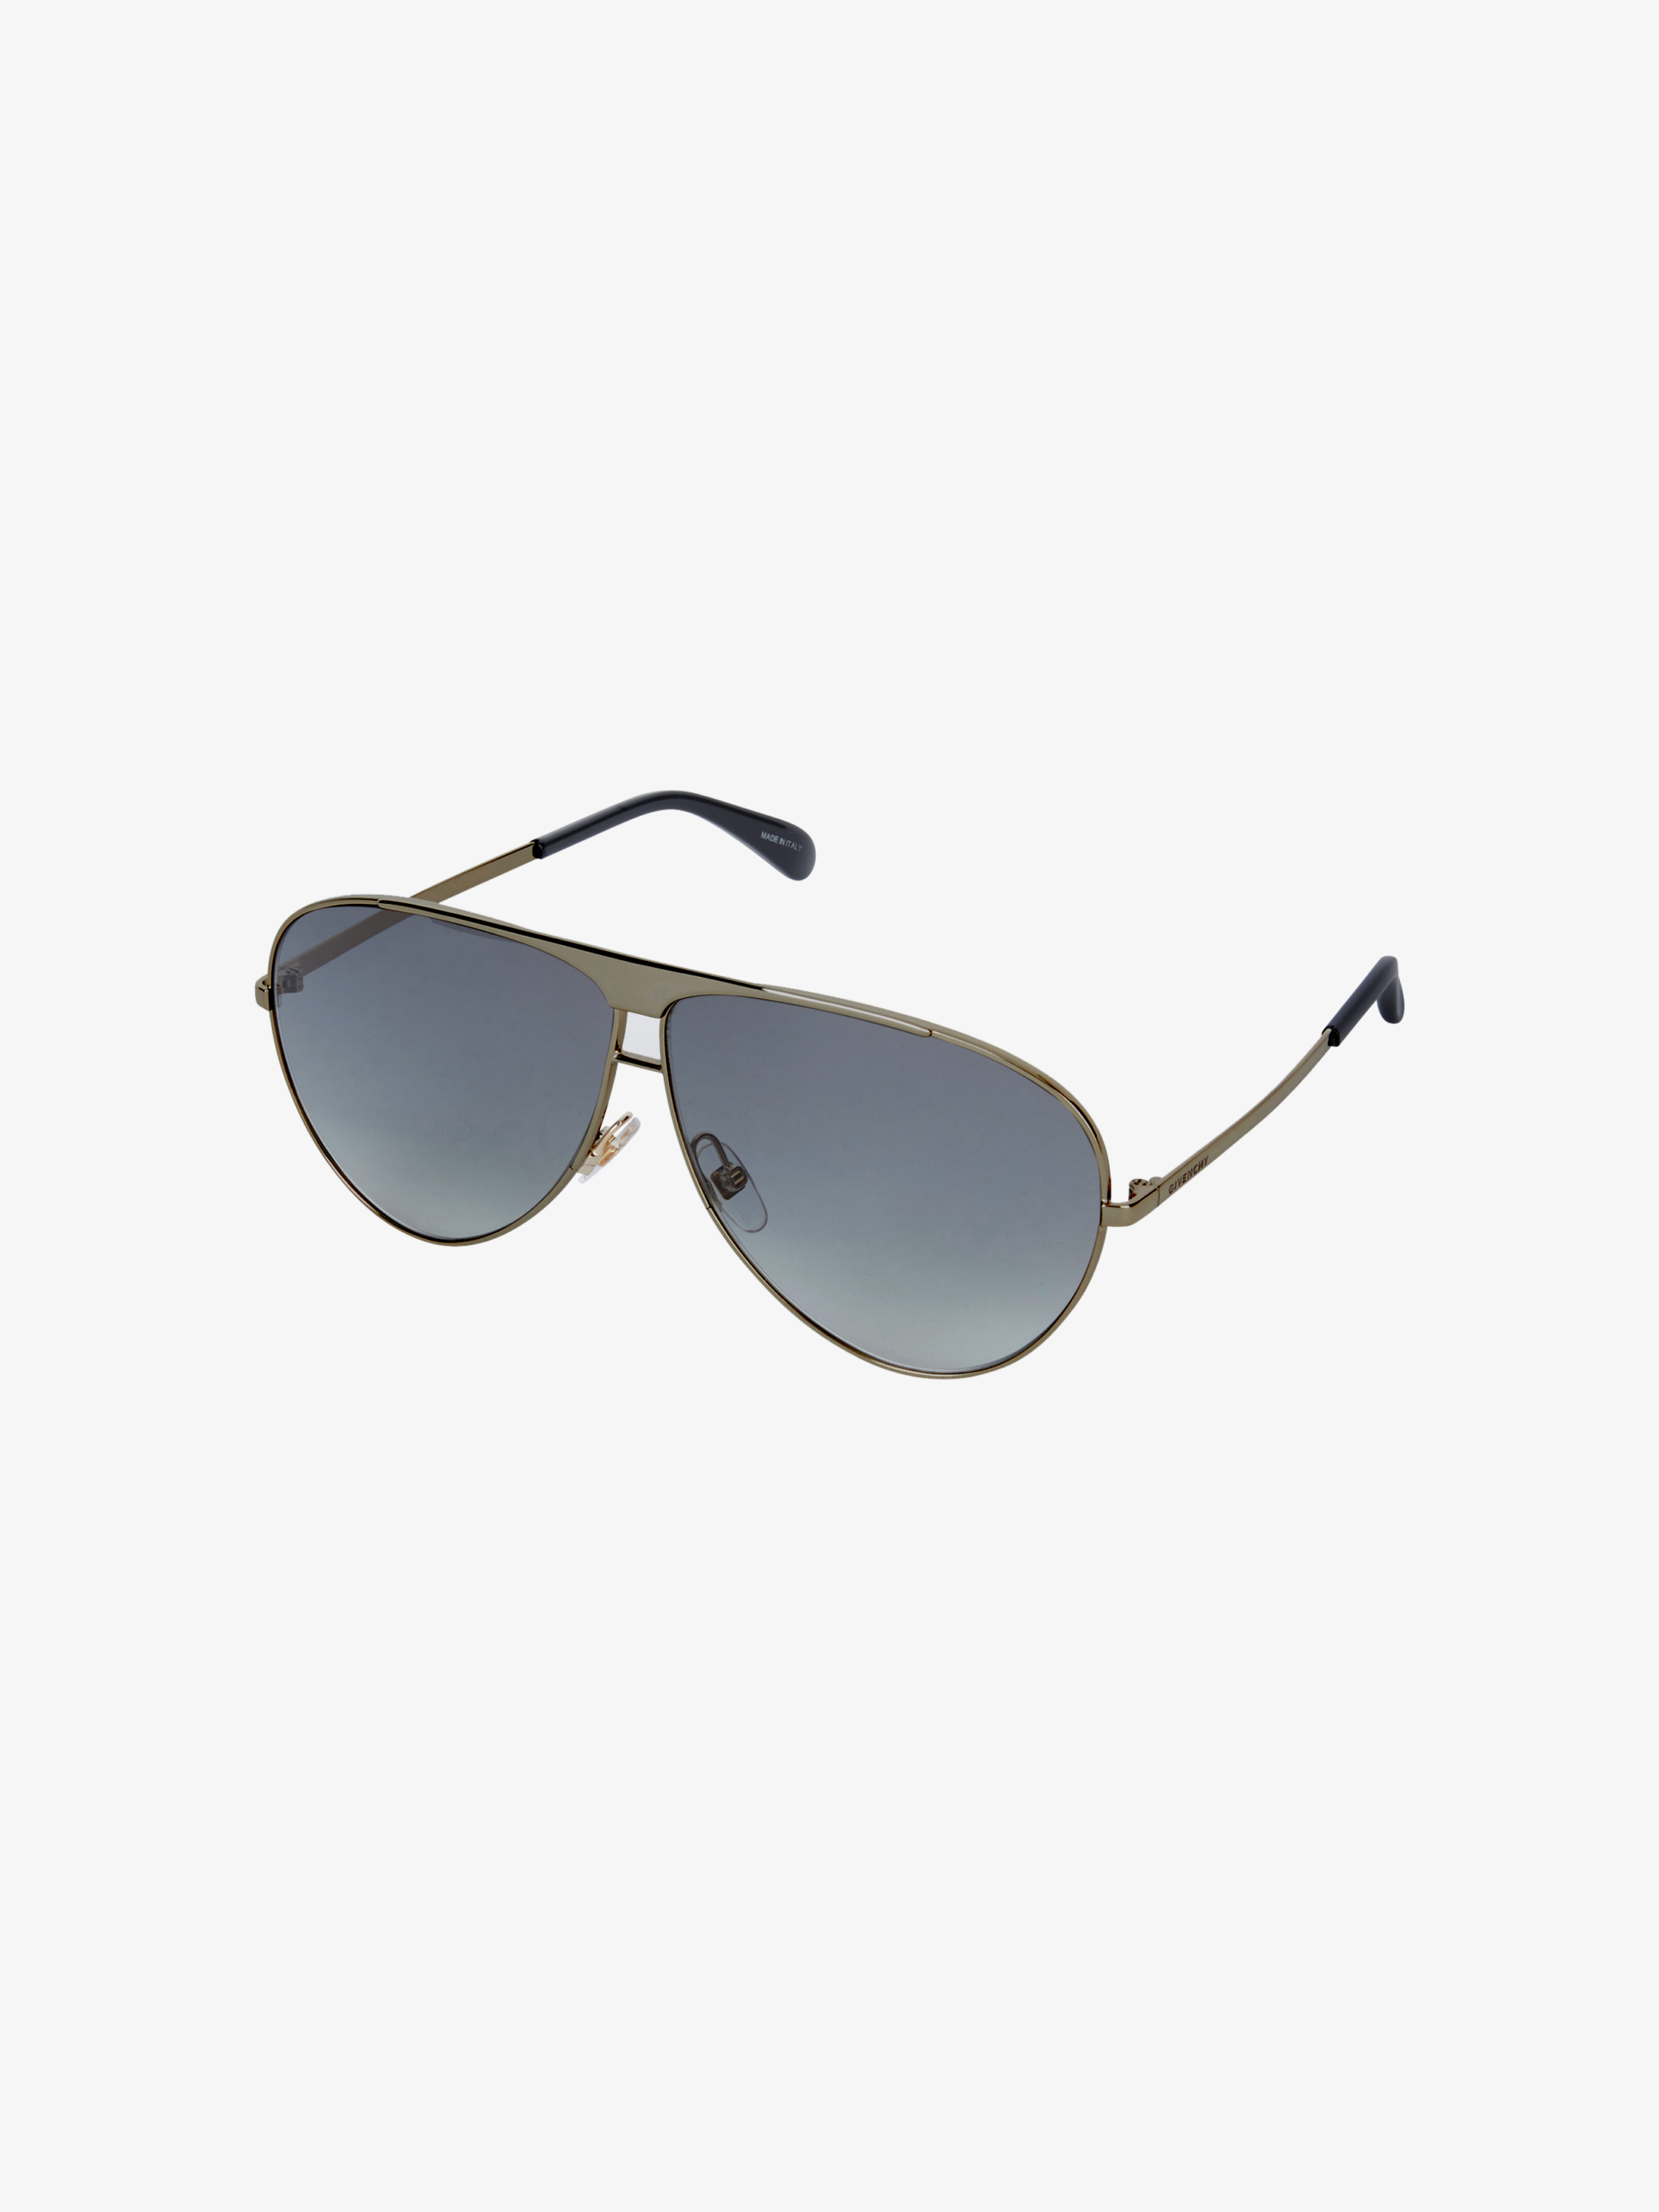 Pilote sunglasses in acetate and metal